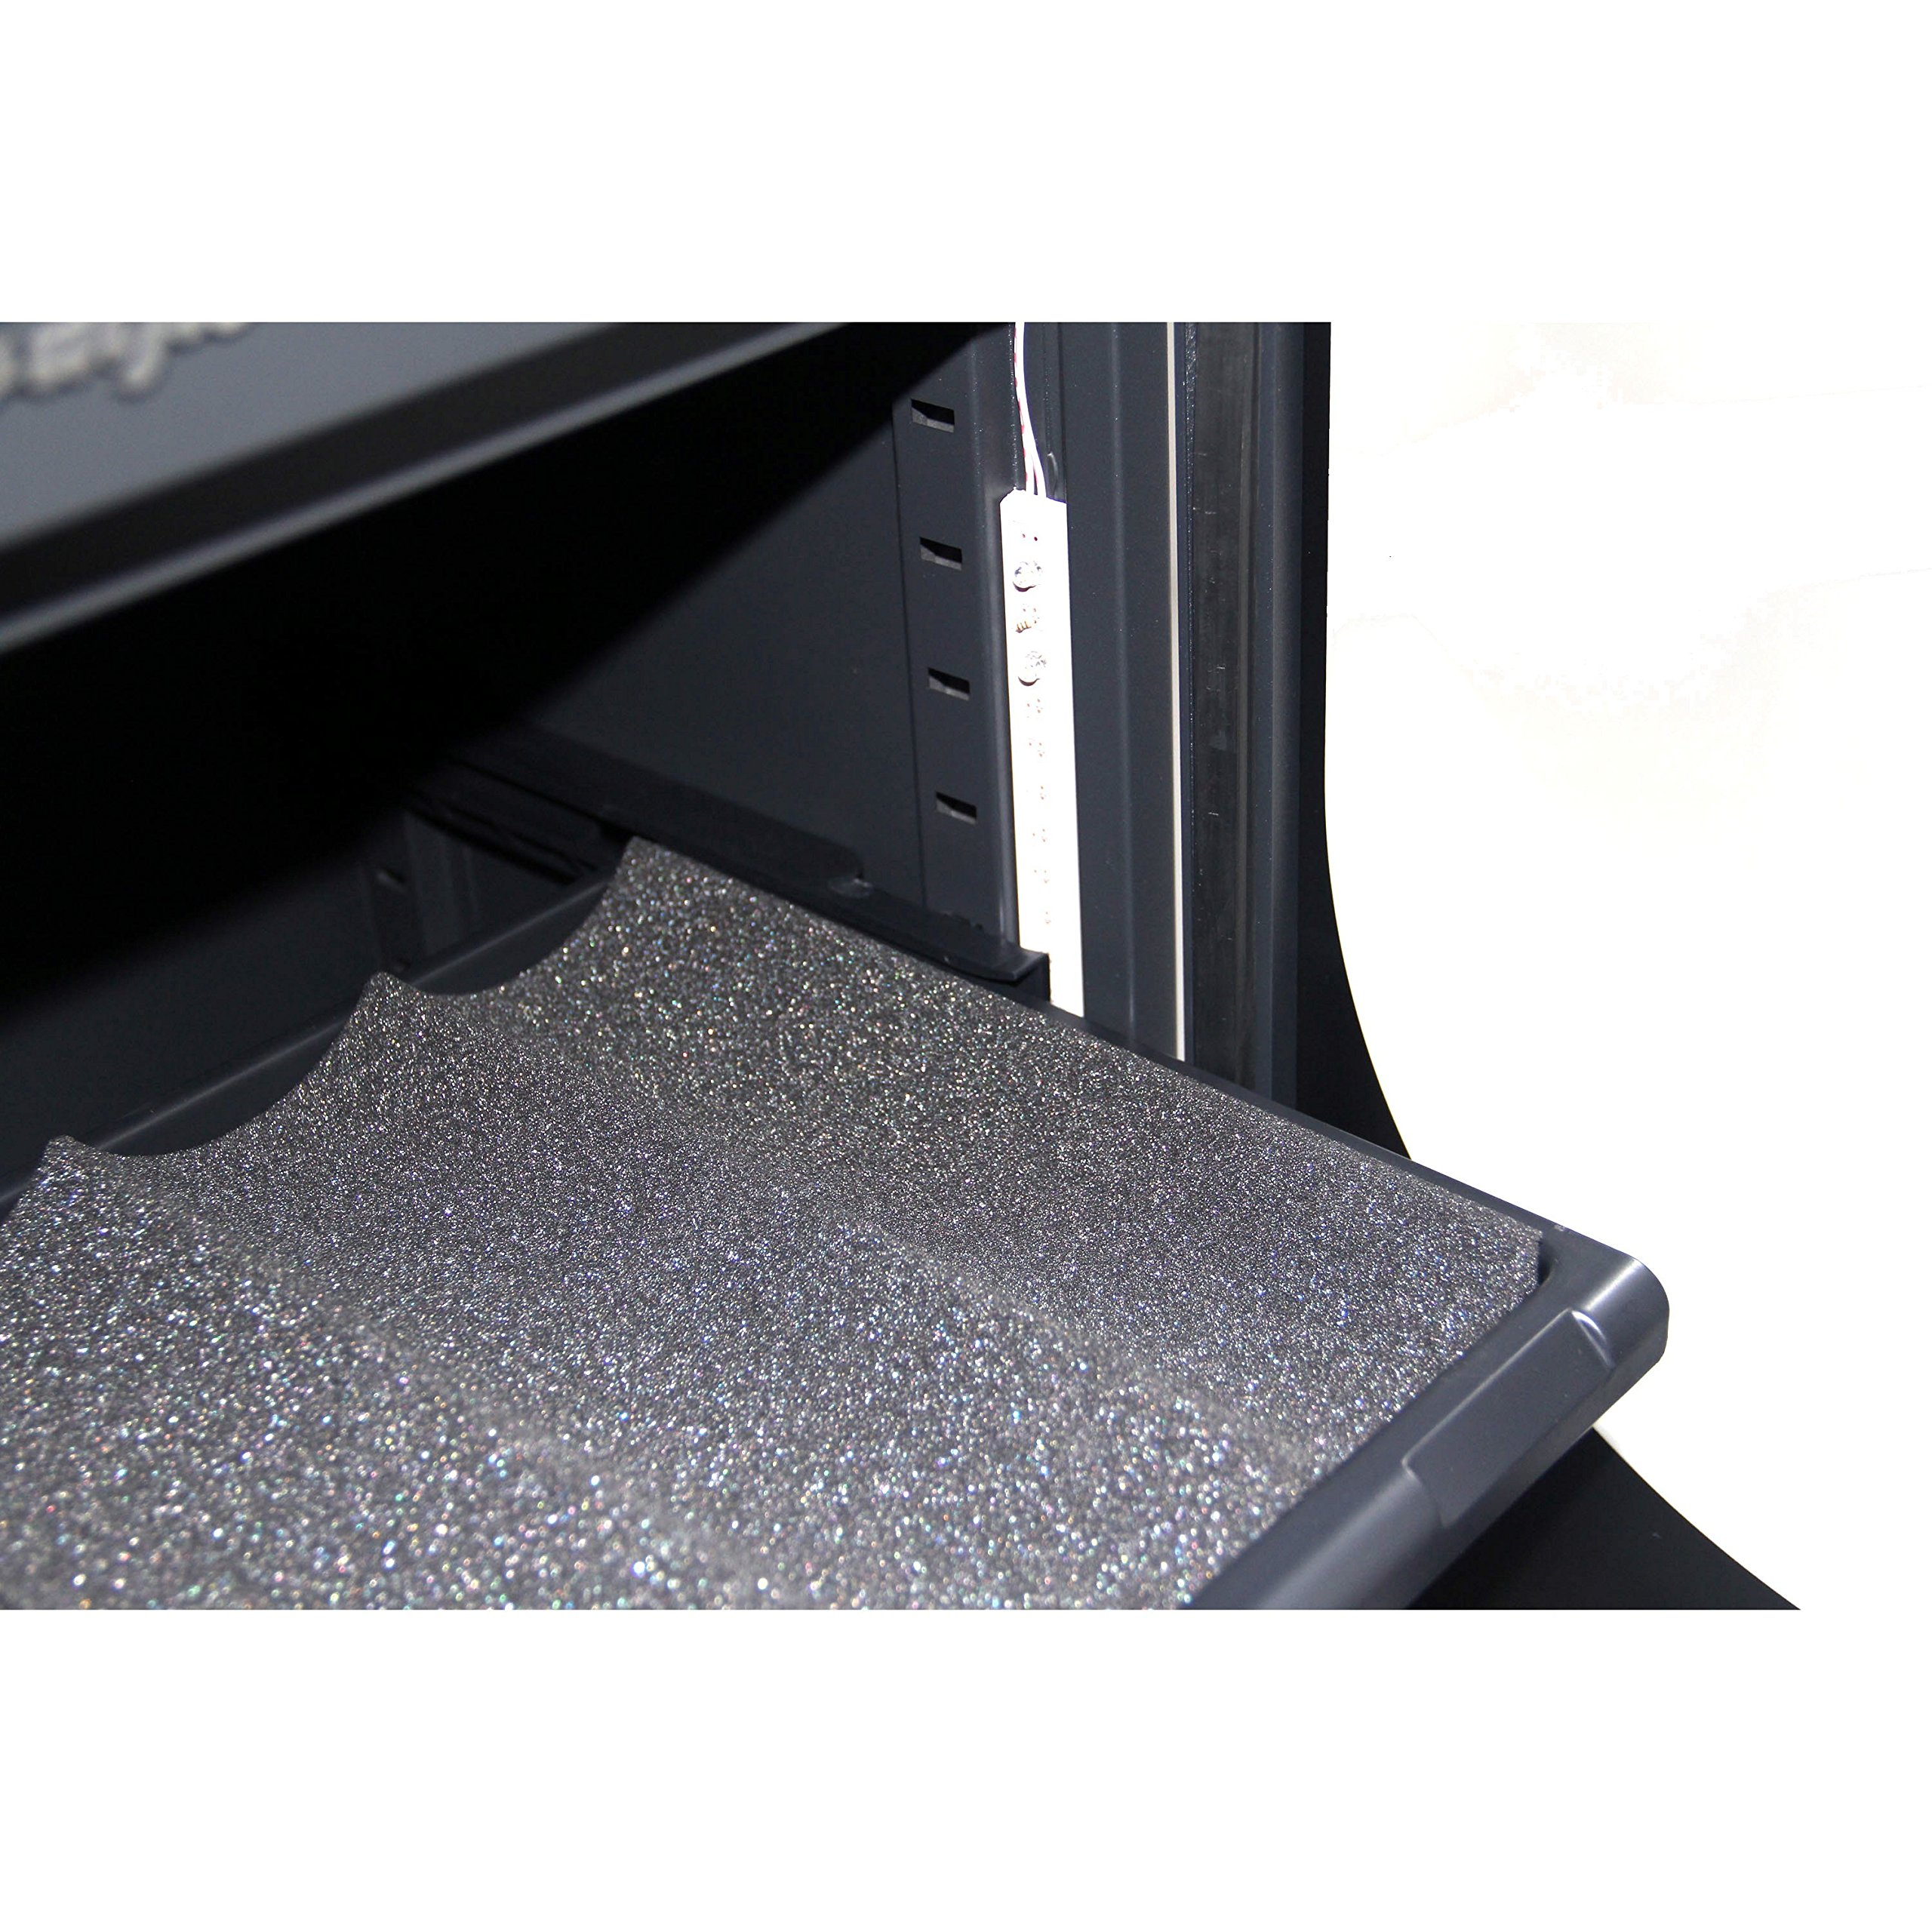 HFS 68L Digital Control dehumidify dry cabinet box Lens Camera equipment storage